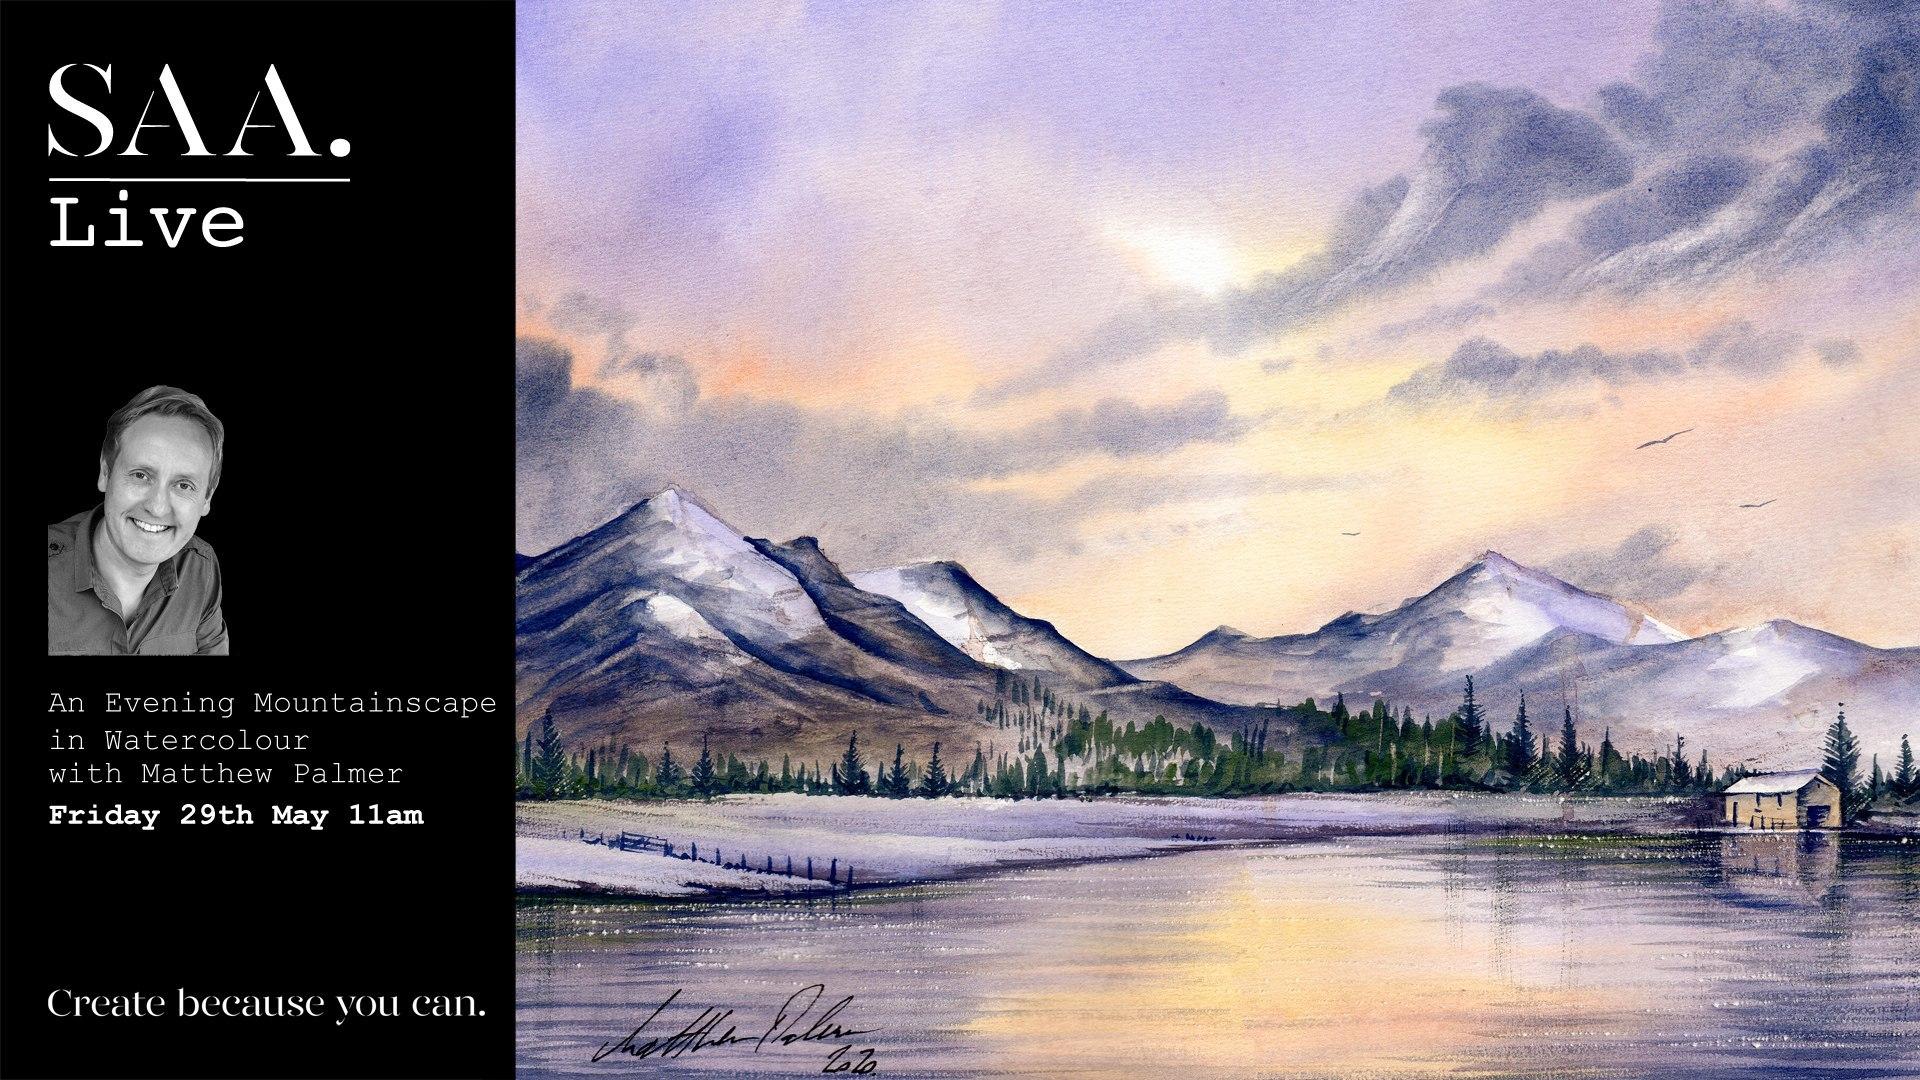 SAA Live – Matthew Palmer Workshop – An Evening Mountainscape in Watercolour